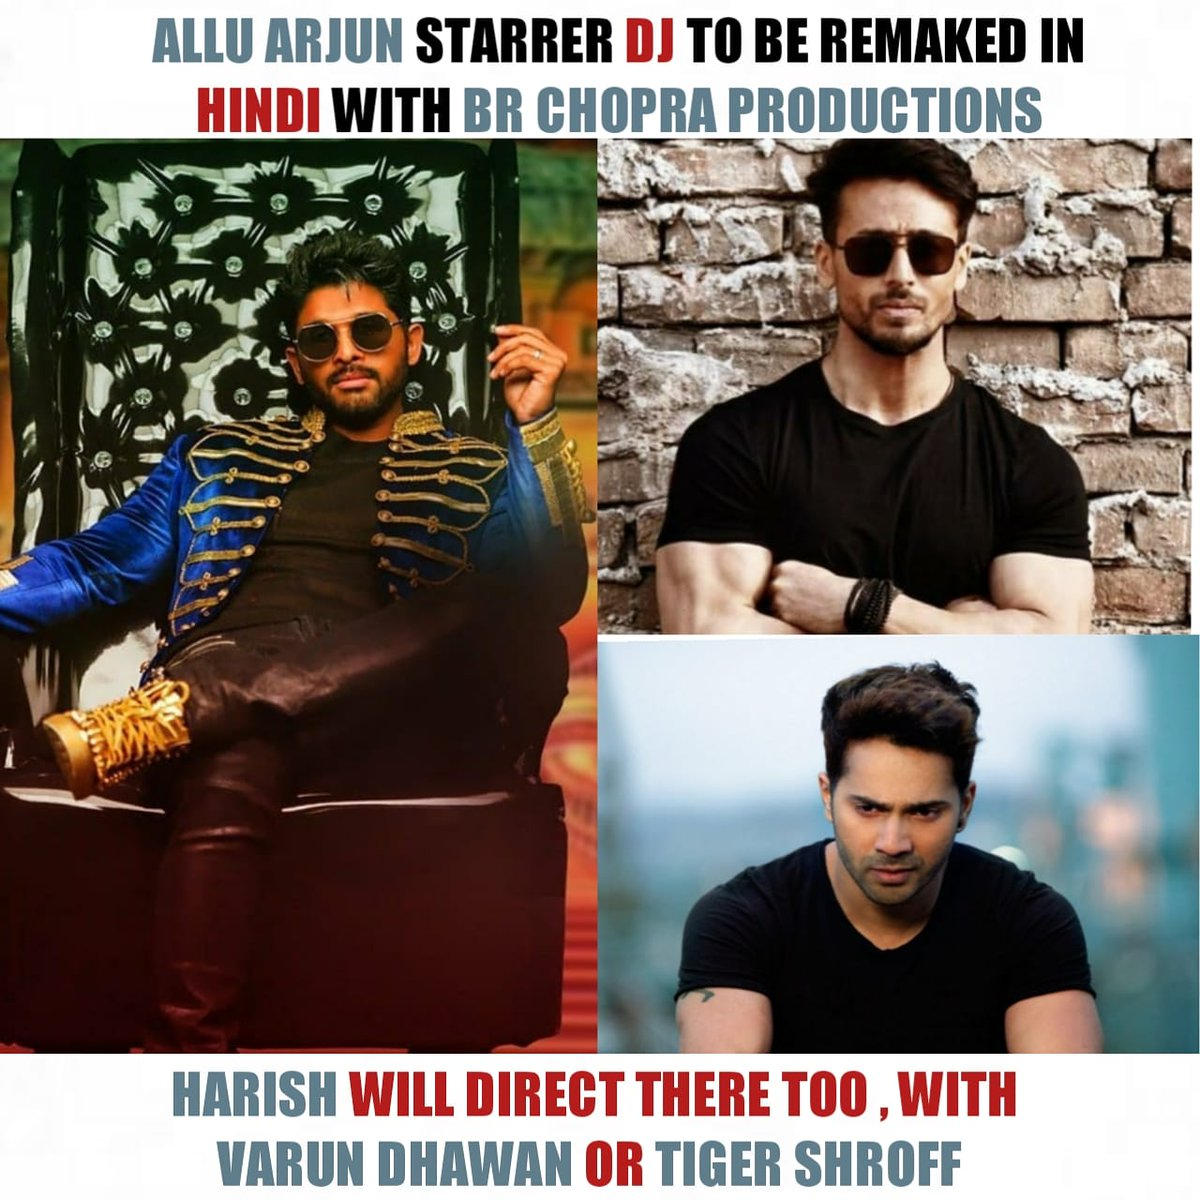 BUZZ 💥💥 @alluarjun @Varun_dvn @iTIGERSHROFF #AlluArjun #VarunDhawan #TigerShroff #DJ #DjinHindi  #CineAspect #3YearsForDJSensation https://t.co/95M5xjgMNu